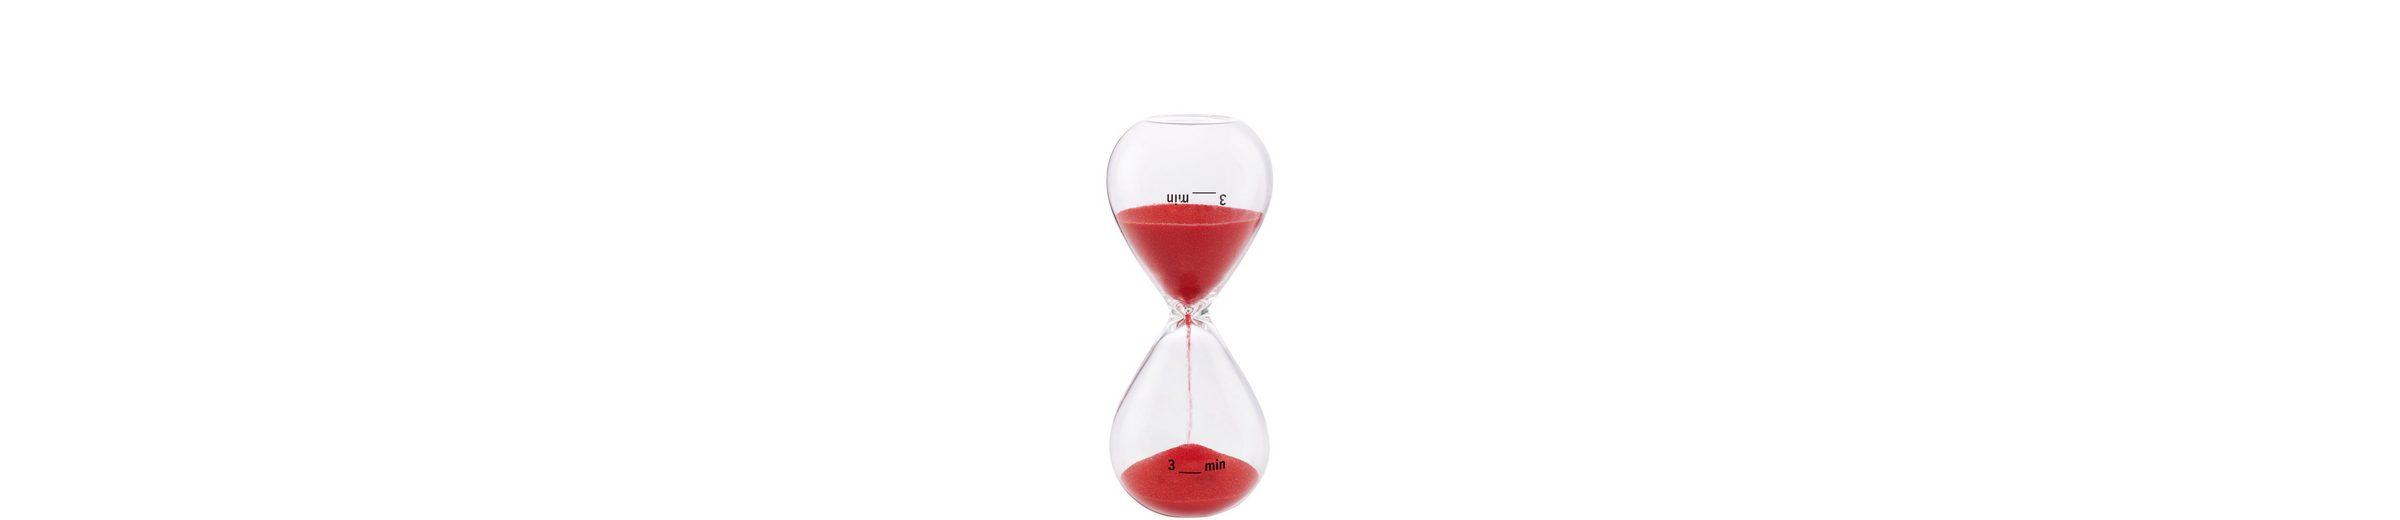 BUTLERS 3 MINUTES »Sanduhr 3 Minuten«